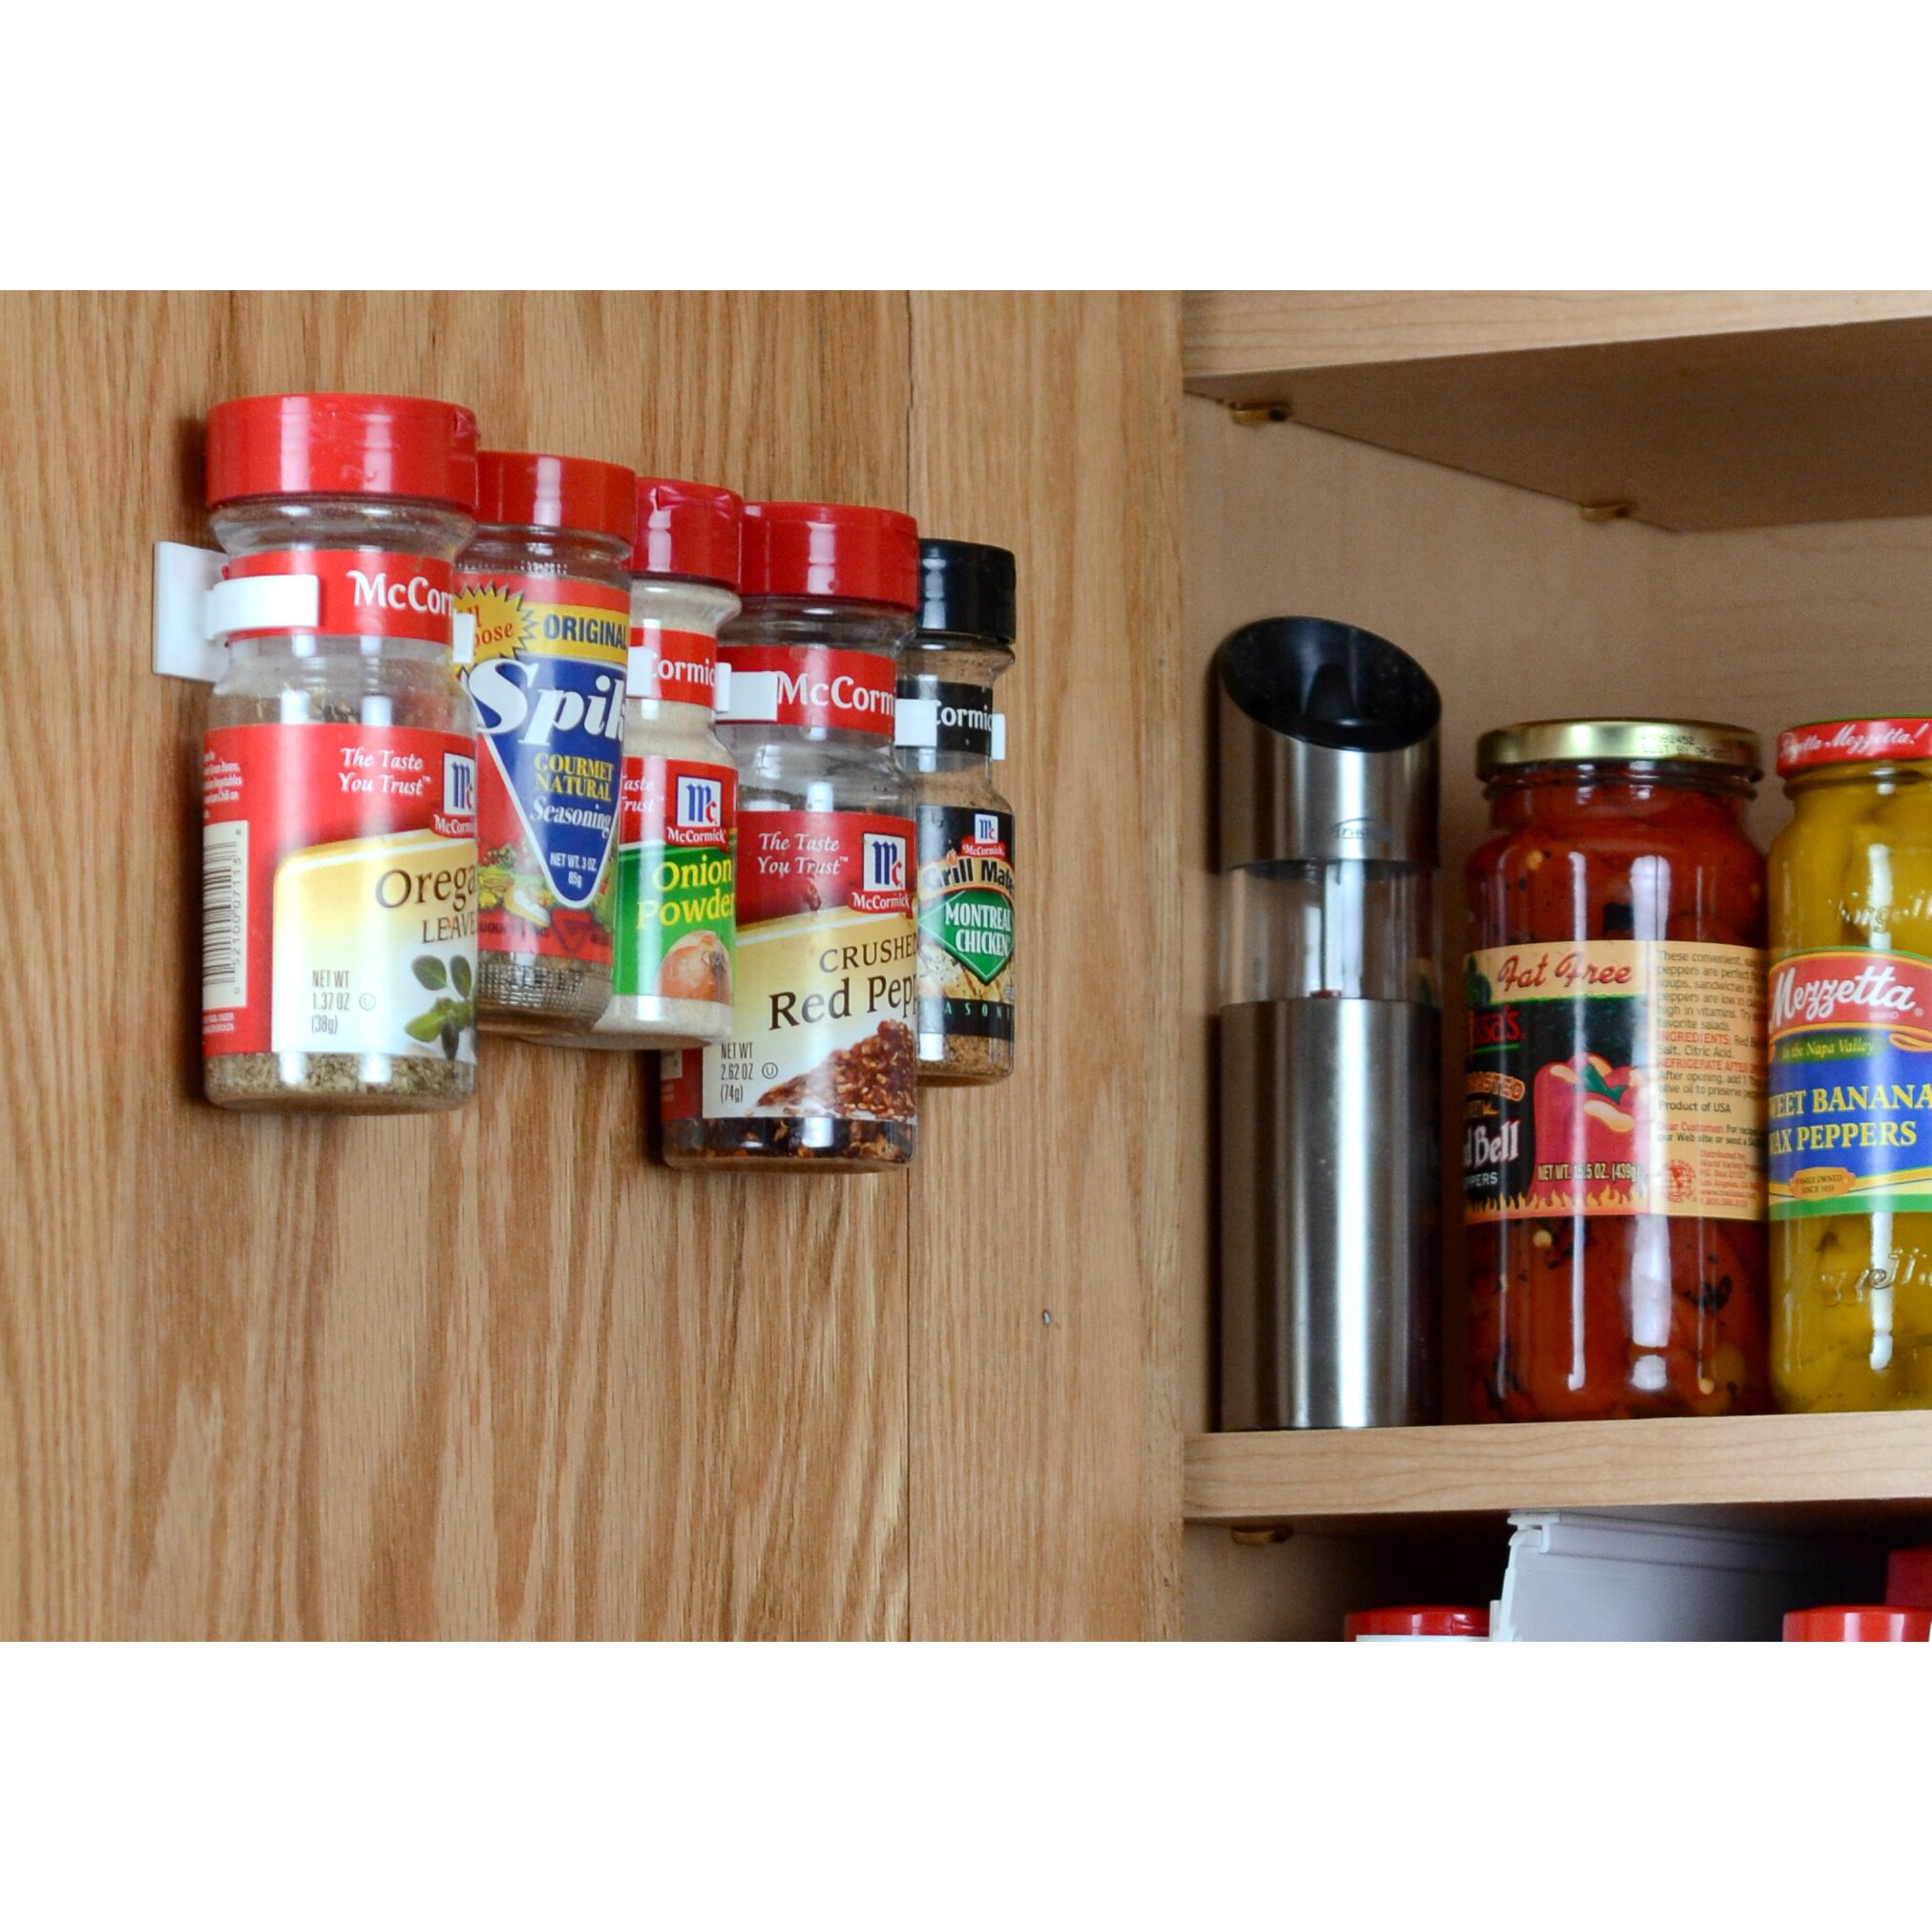 Spicestor Cabinet Door 20 Clip Spice Rack Organizer ...